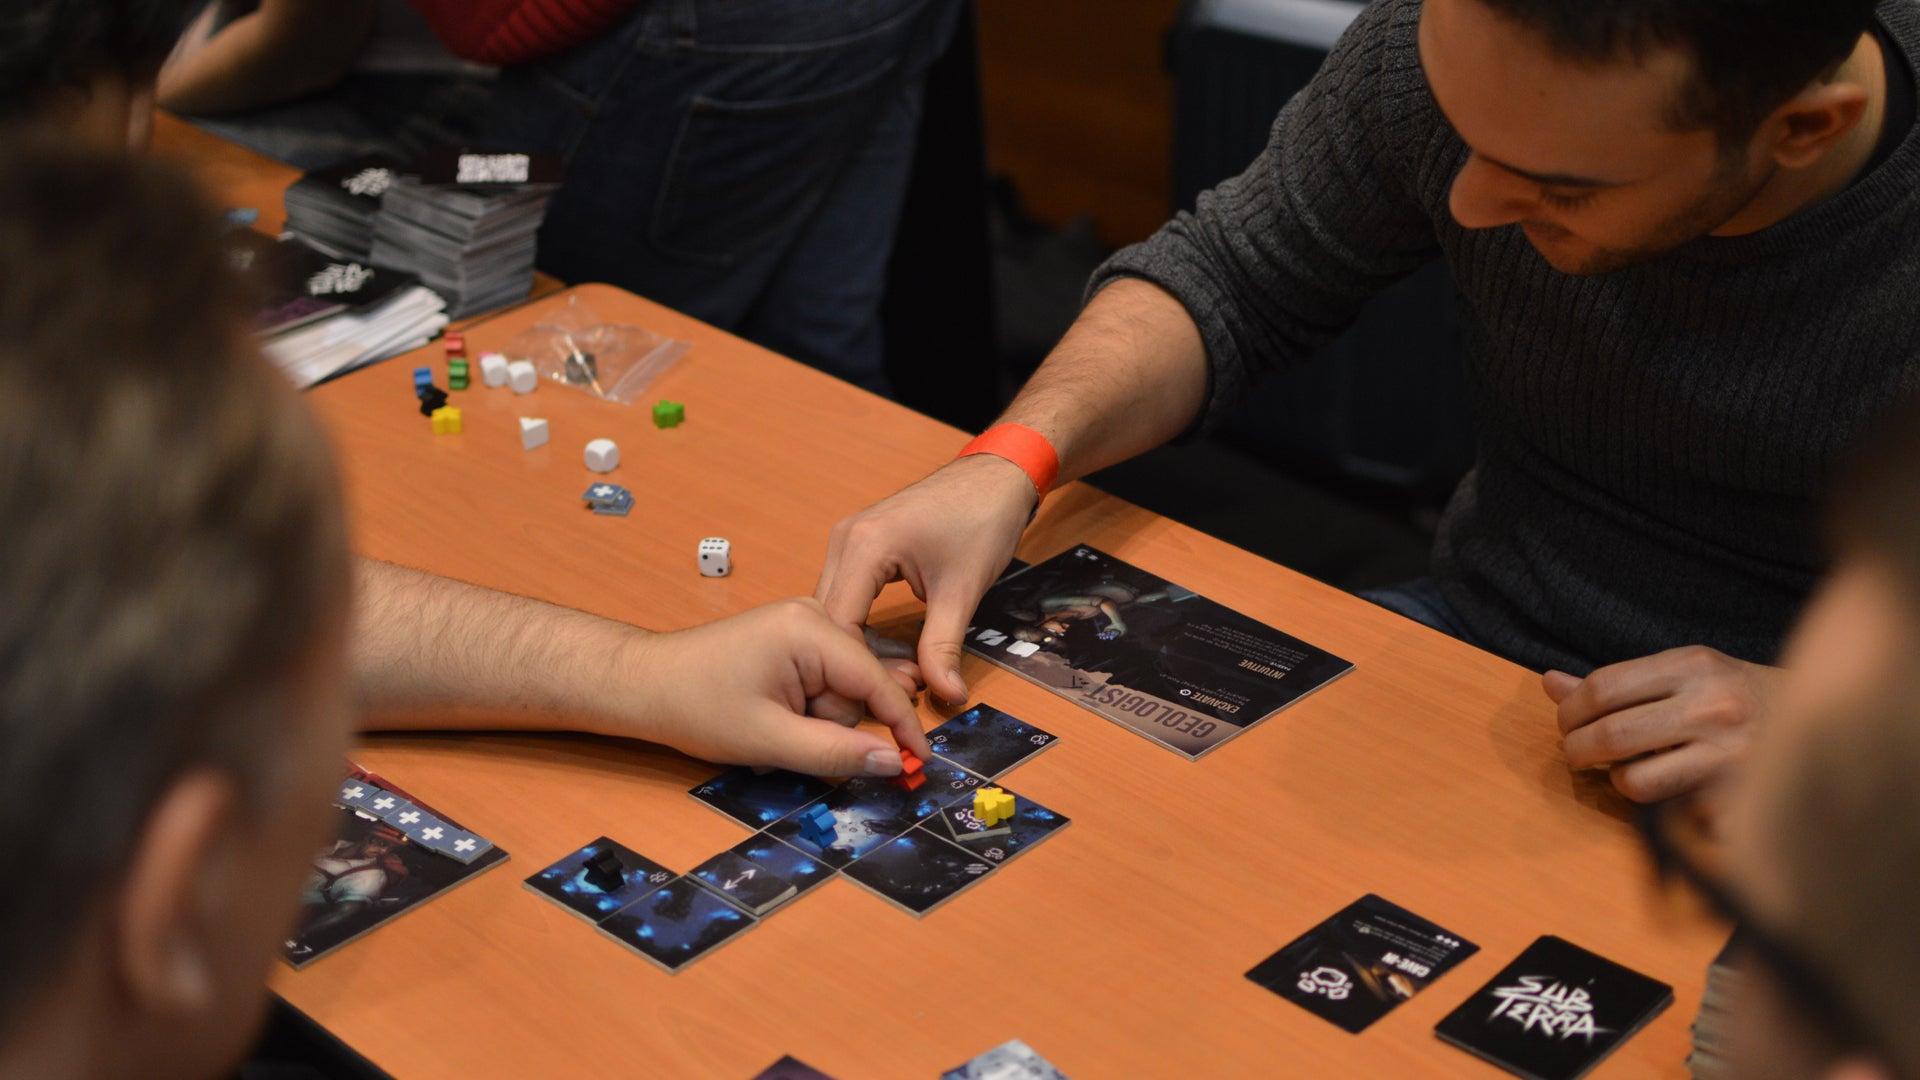 sub-terra-board-game-gameplay.JPG